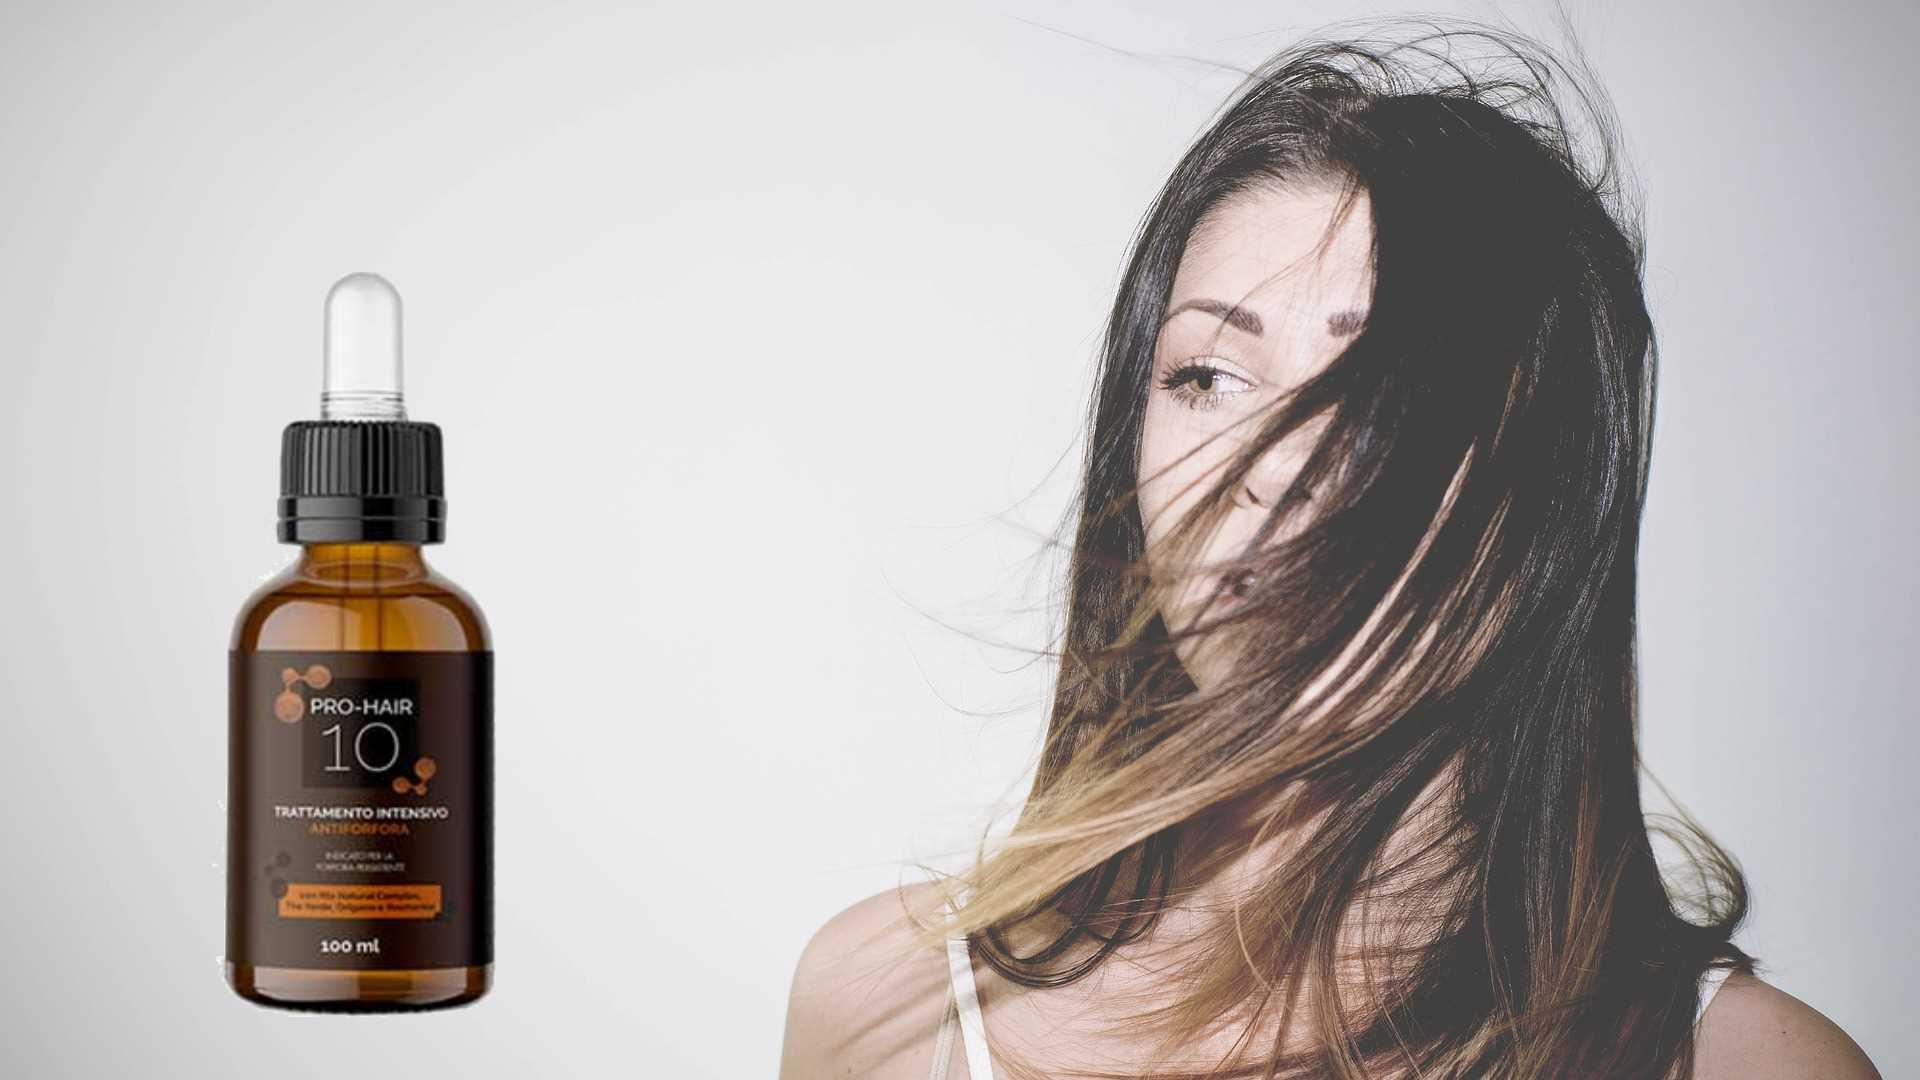 Pro hair 10 lozione anti forfora